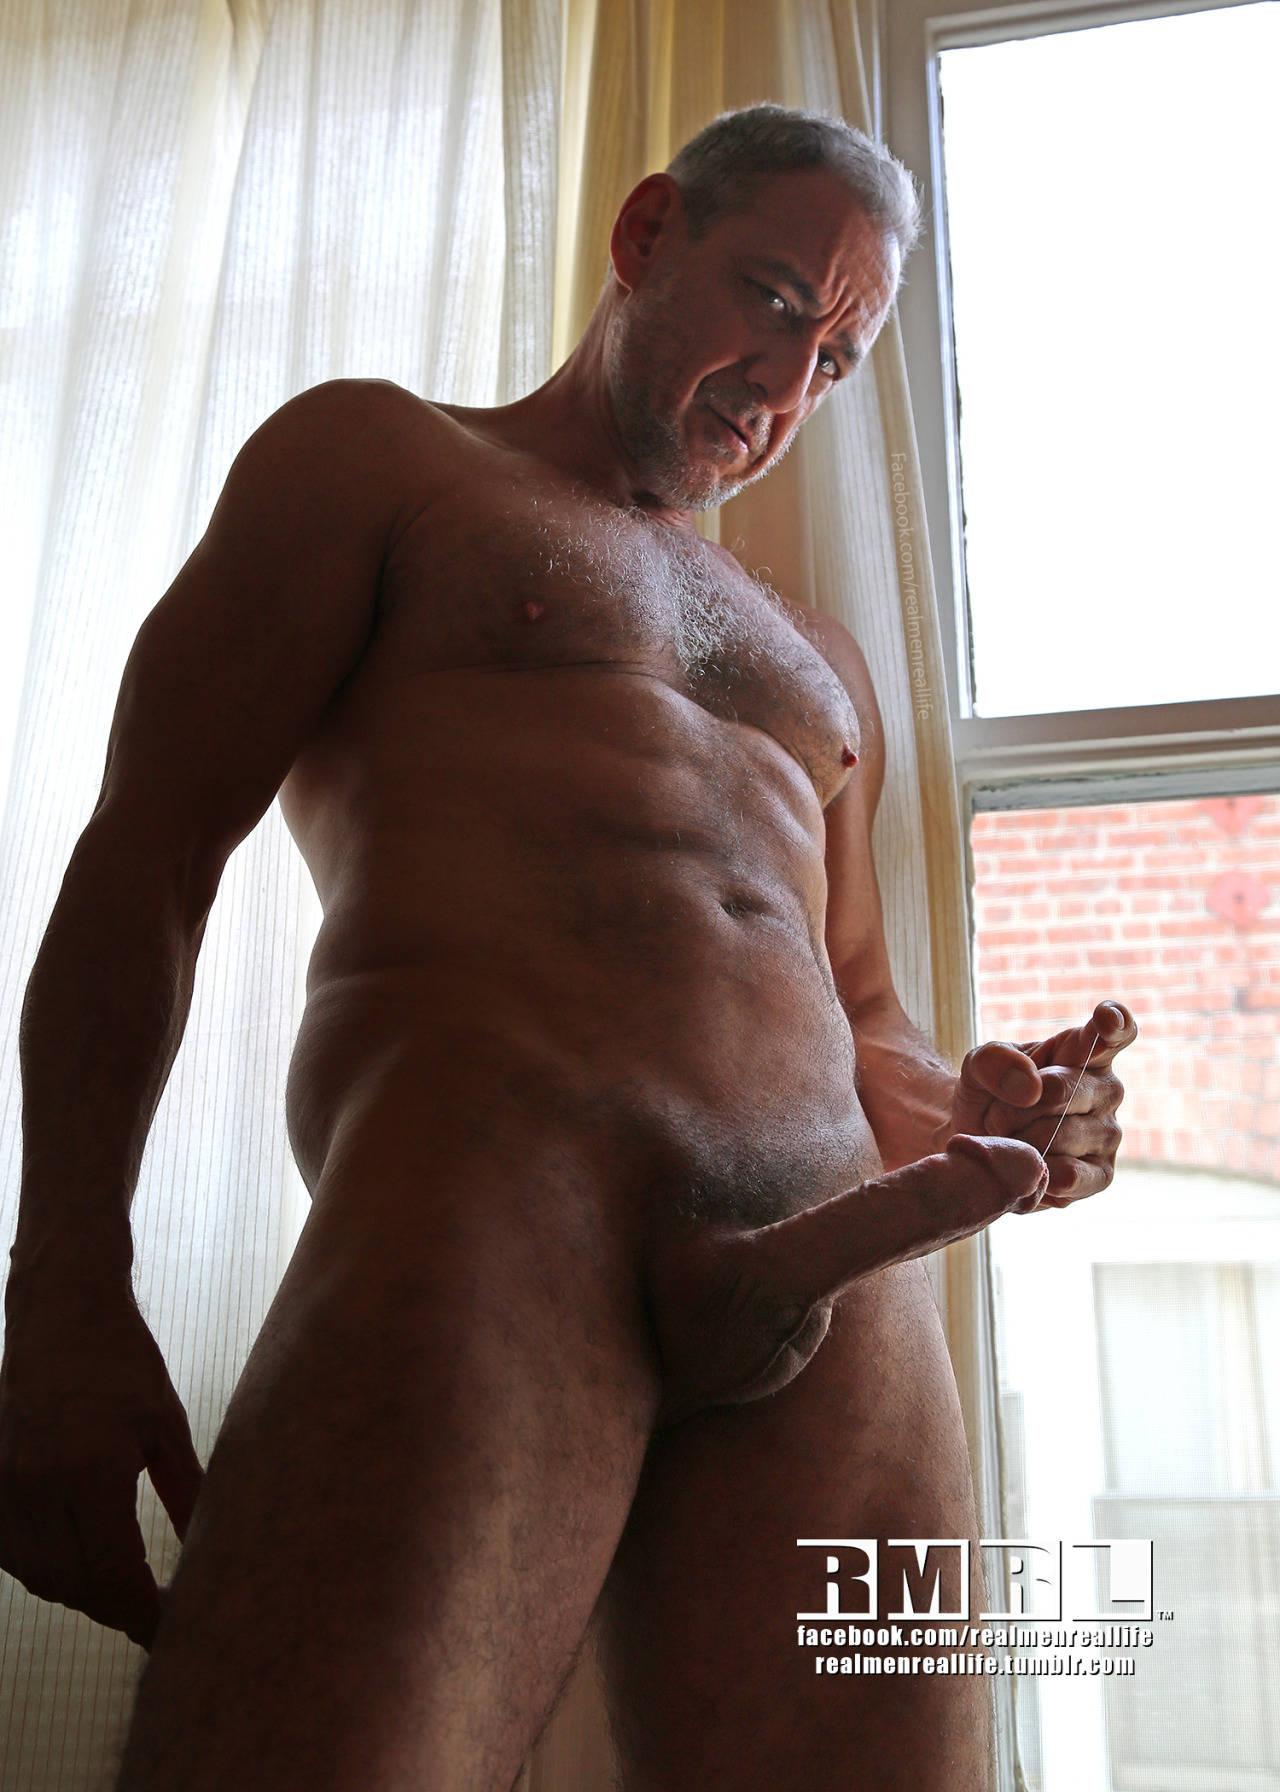 14 inch dick gets some lovin039 3